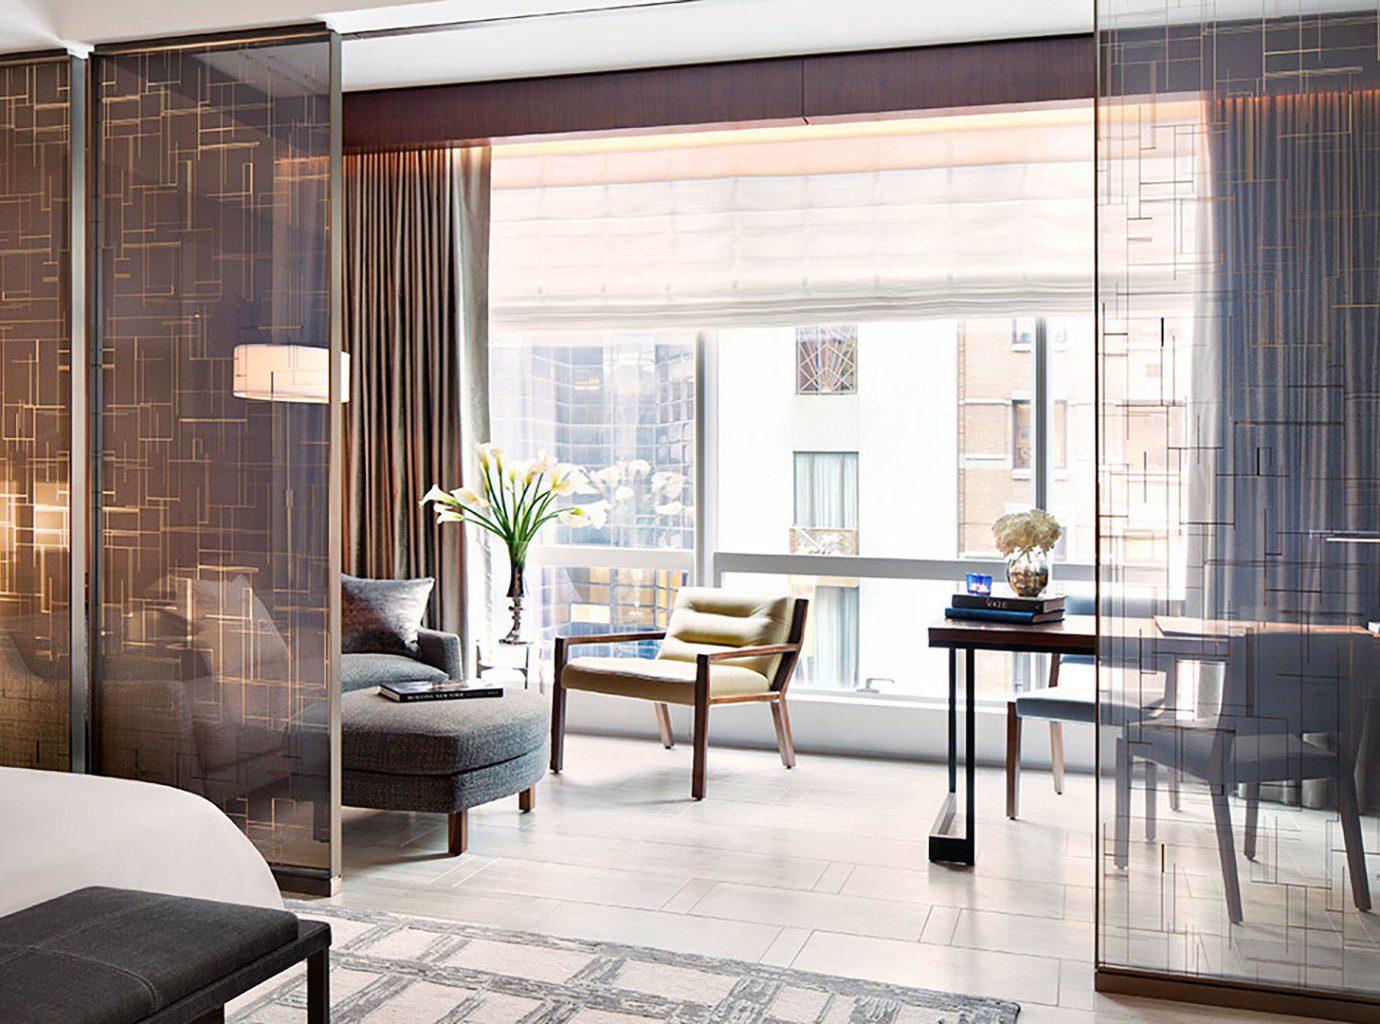 Bedroom Luxury Modern Suite property building living room glass condominium home hardwood loft flooring